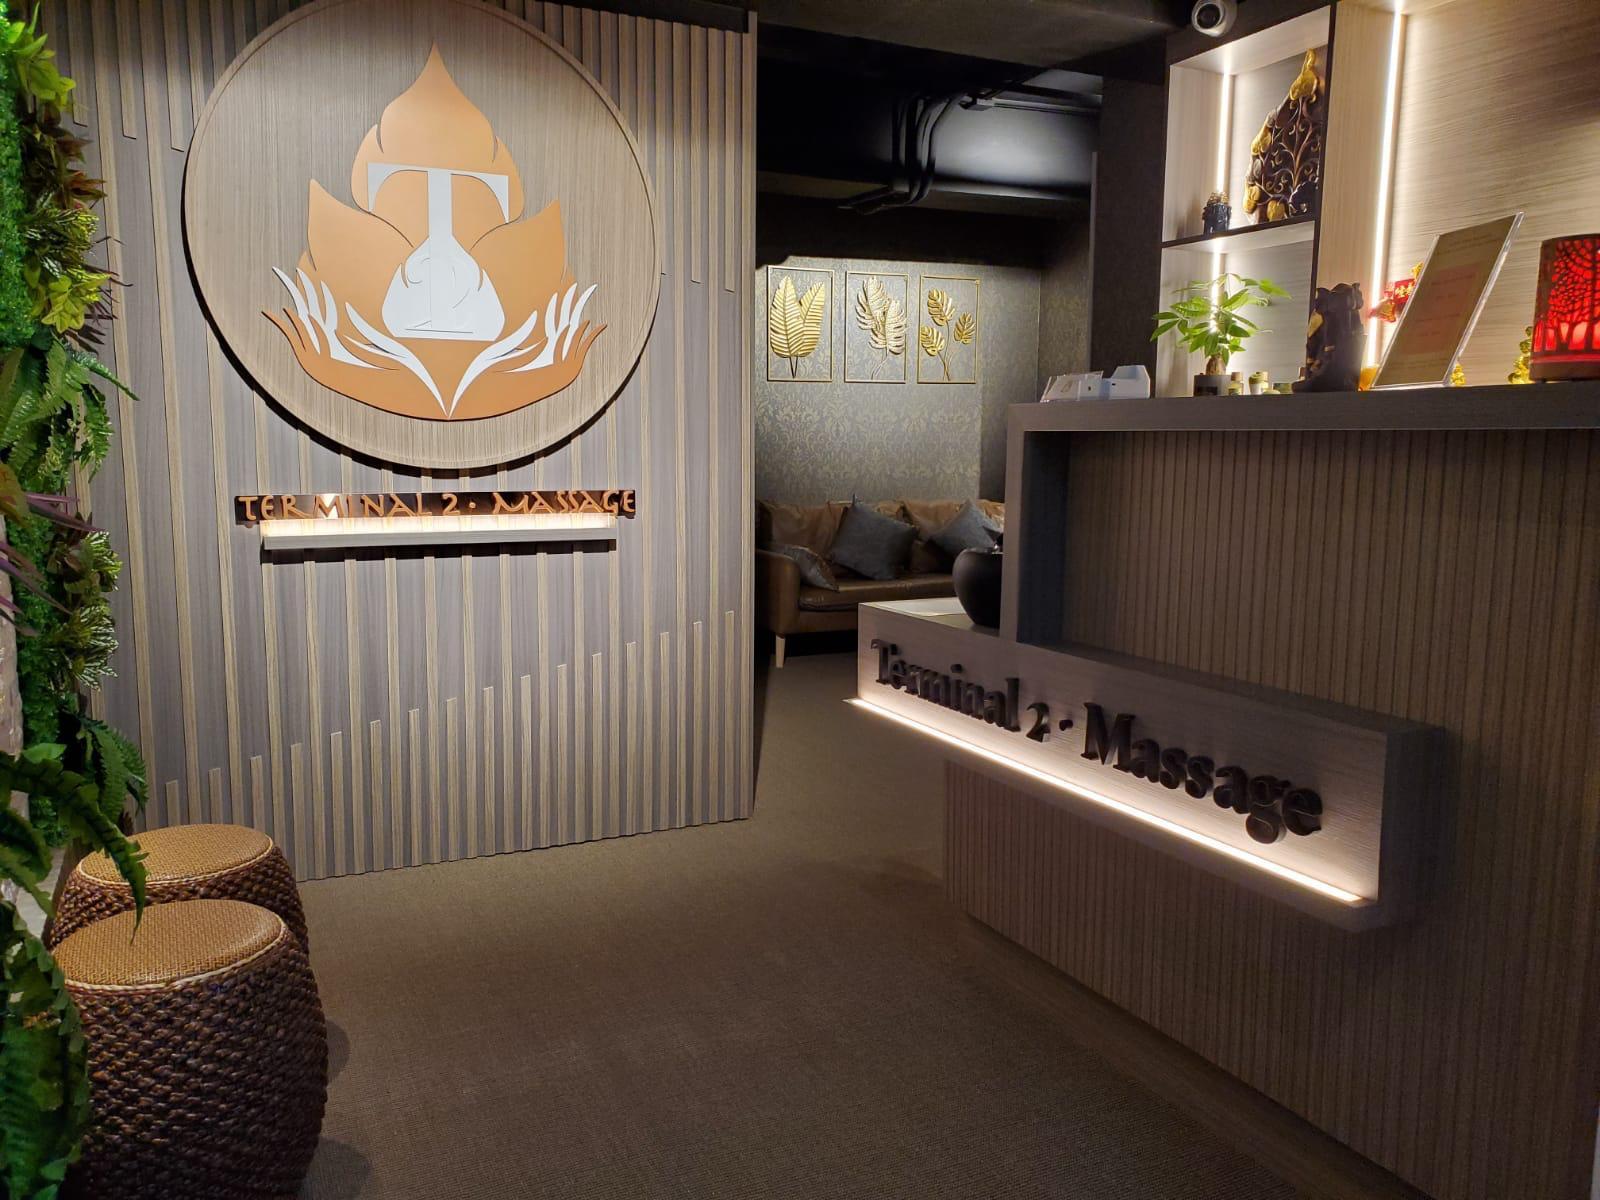 Terminal 2 Massage 泰爽